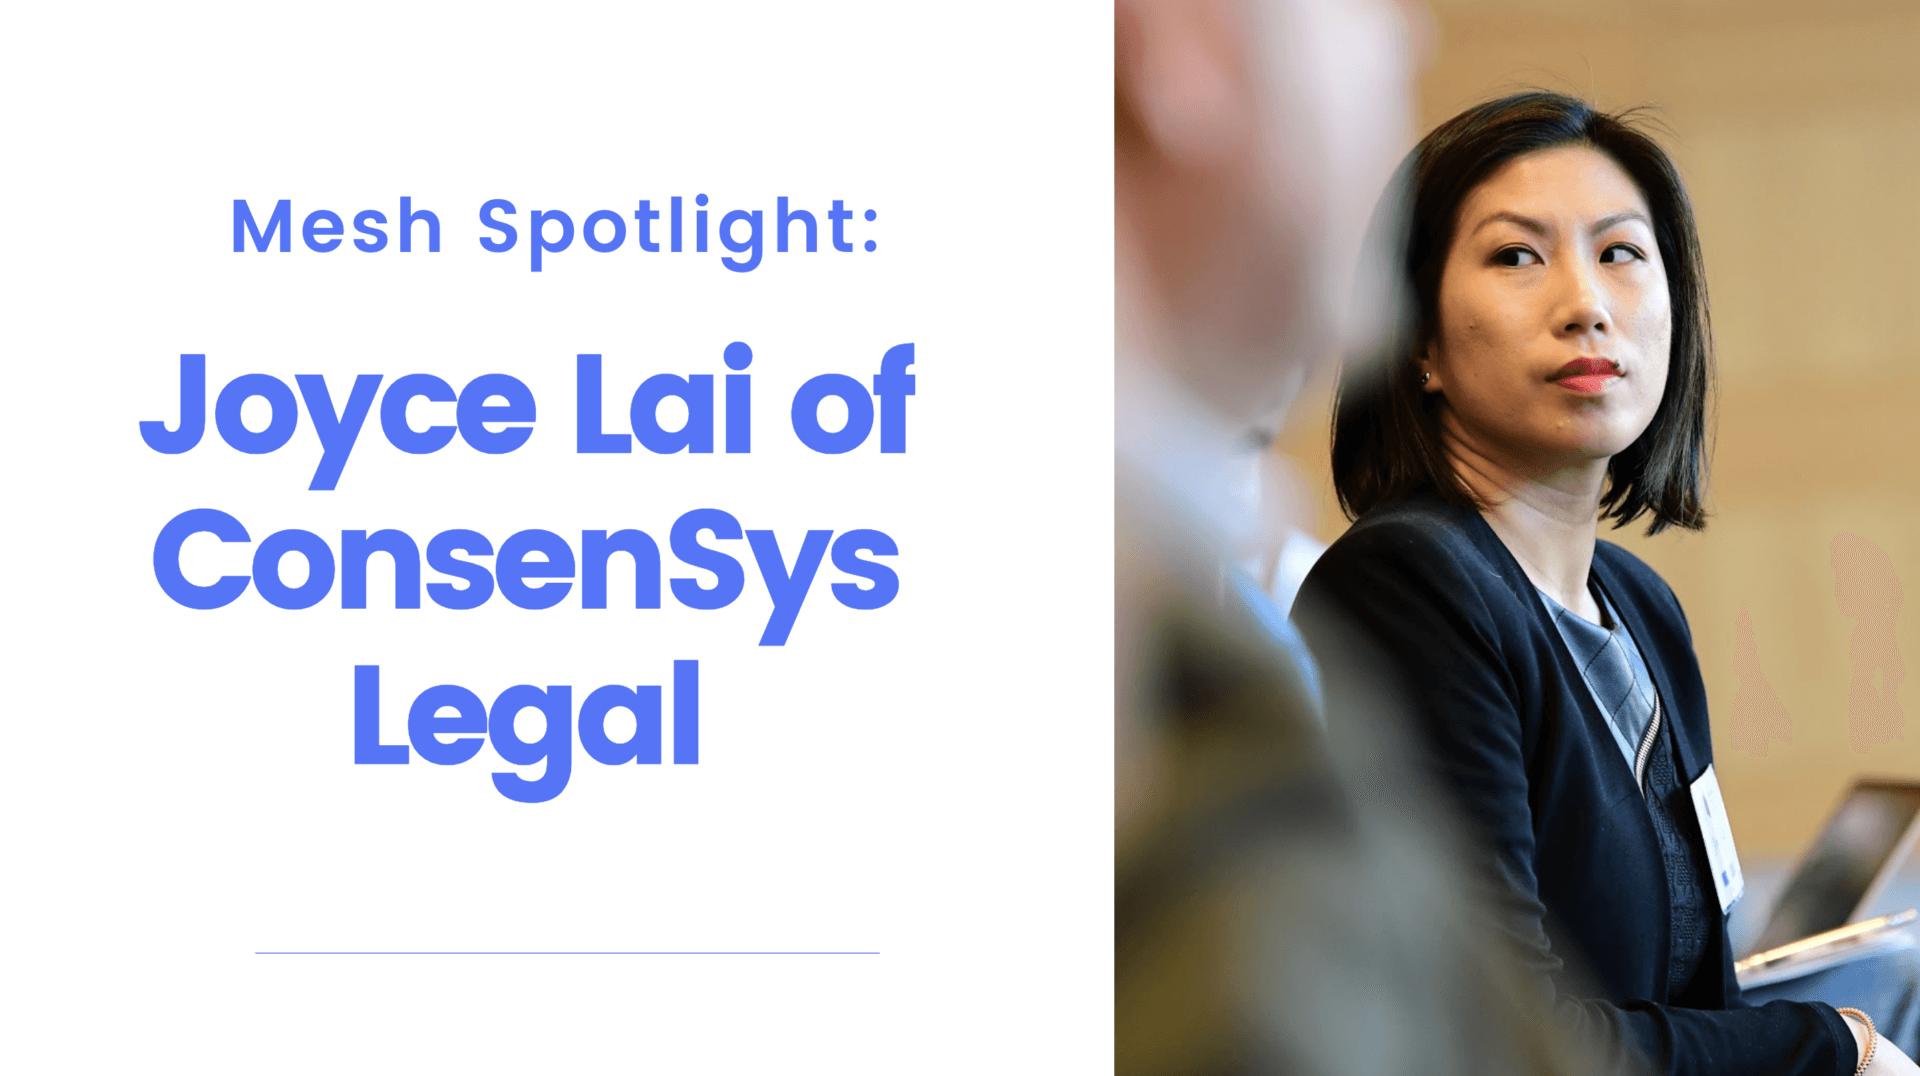 Joyce Lai of ConsenSys Legal